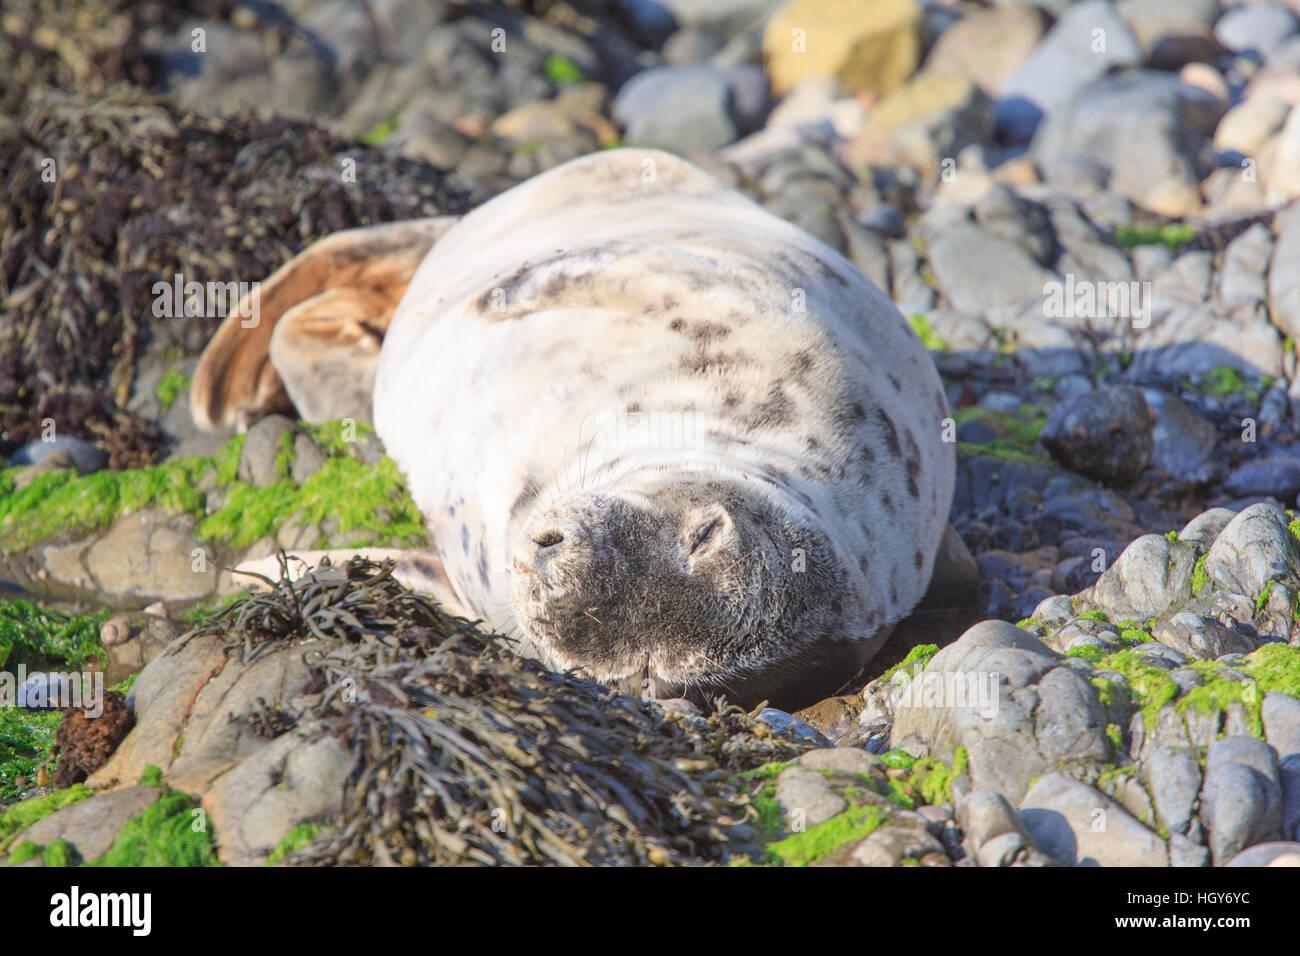 Young grey seal (Halichoerus grypus) lazing on a rocky beach, Pembrokeshire, Wales, UK Stock Photo